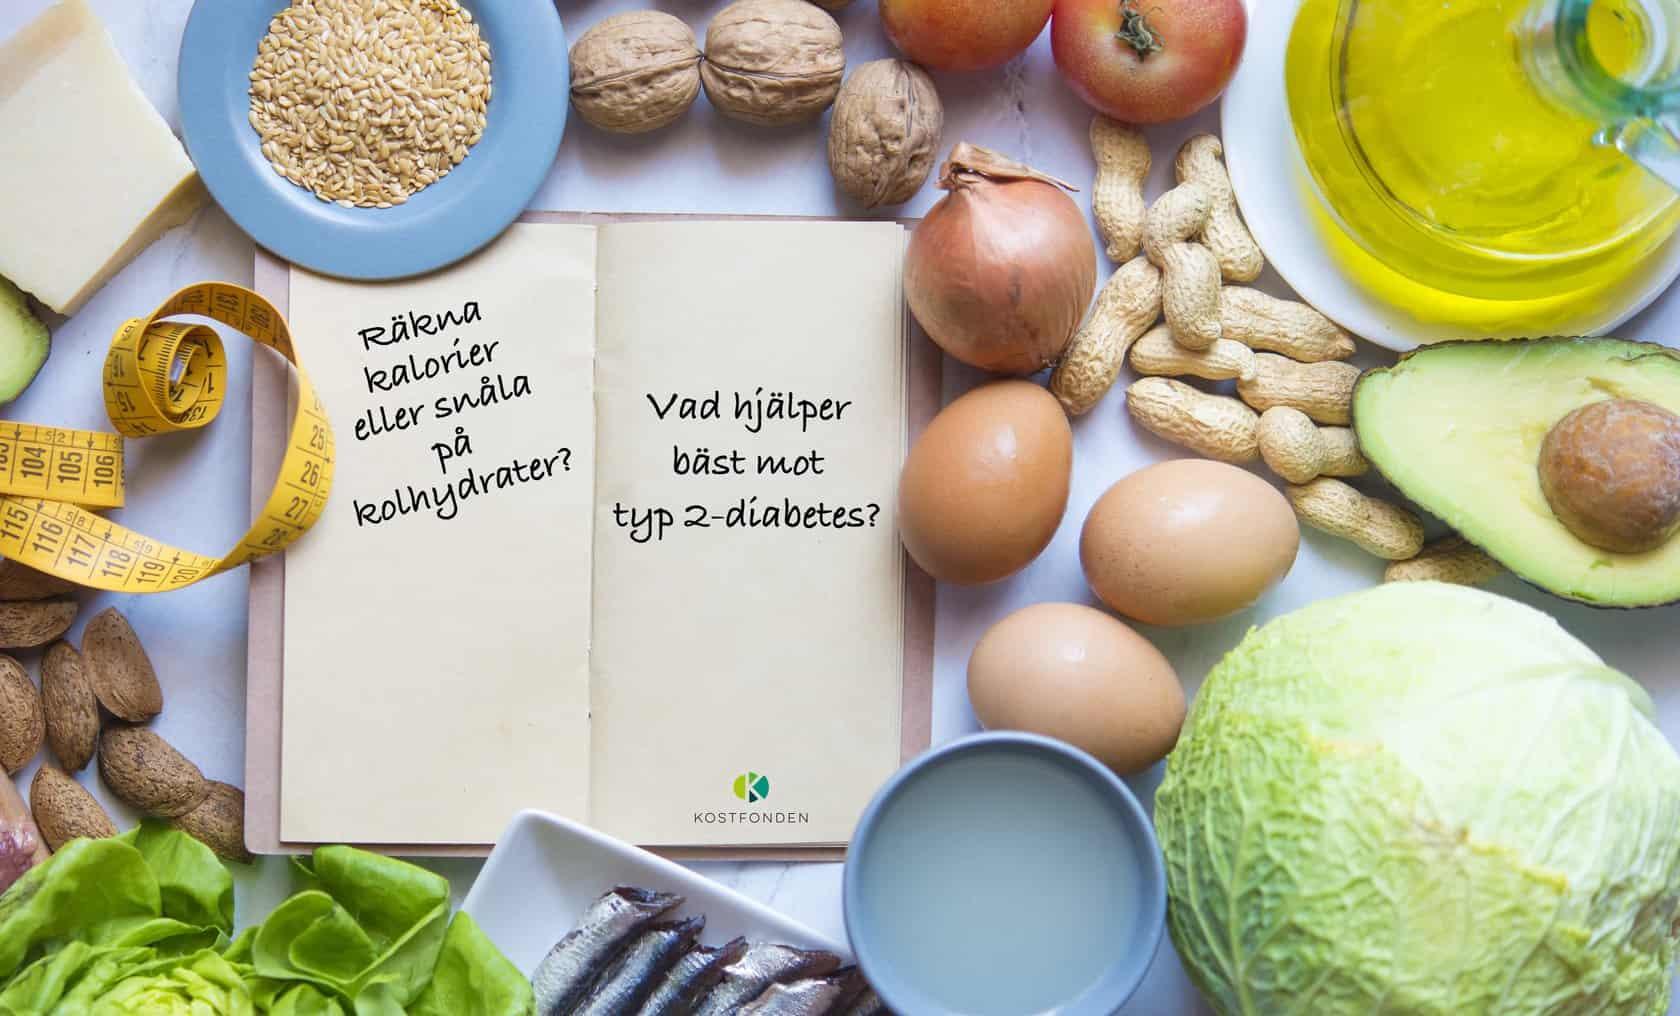 Kostfonden: Europas största studie av kost vid typ 2-diabetes